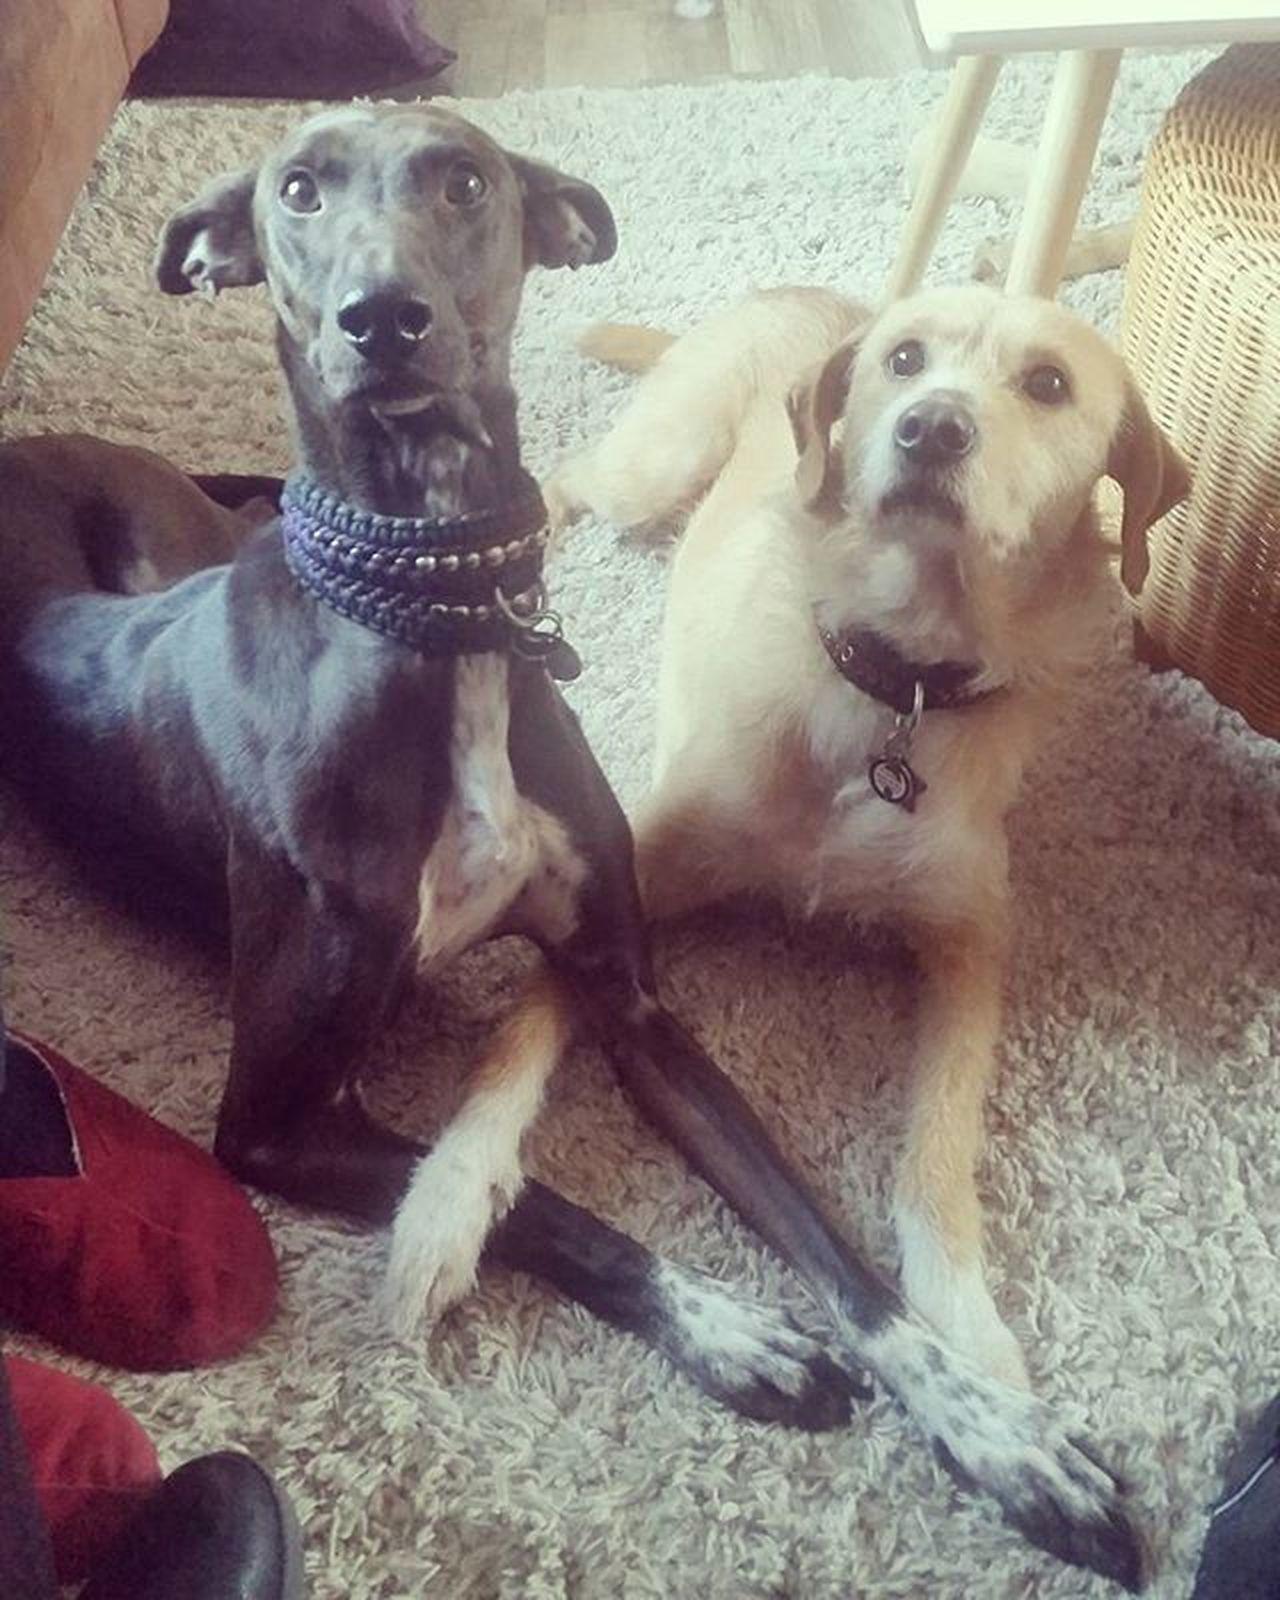 Instapodenco Podencoworld Podenco Spaansepodenco Adopted AdoptDontShop Suha Sinne Hondjes Liefde Love Pet Huisdier Hondje Portugeesepodenco